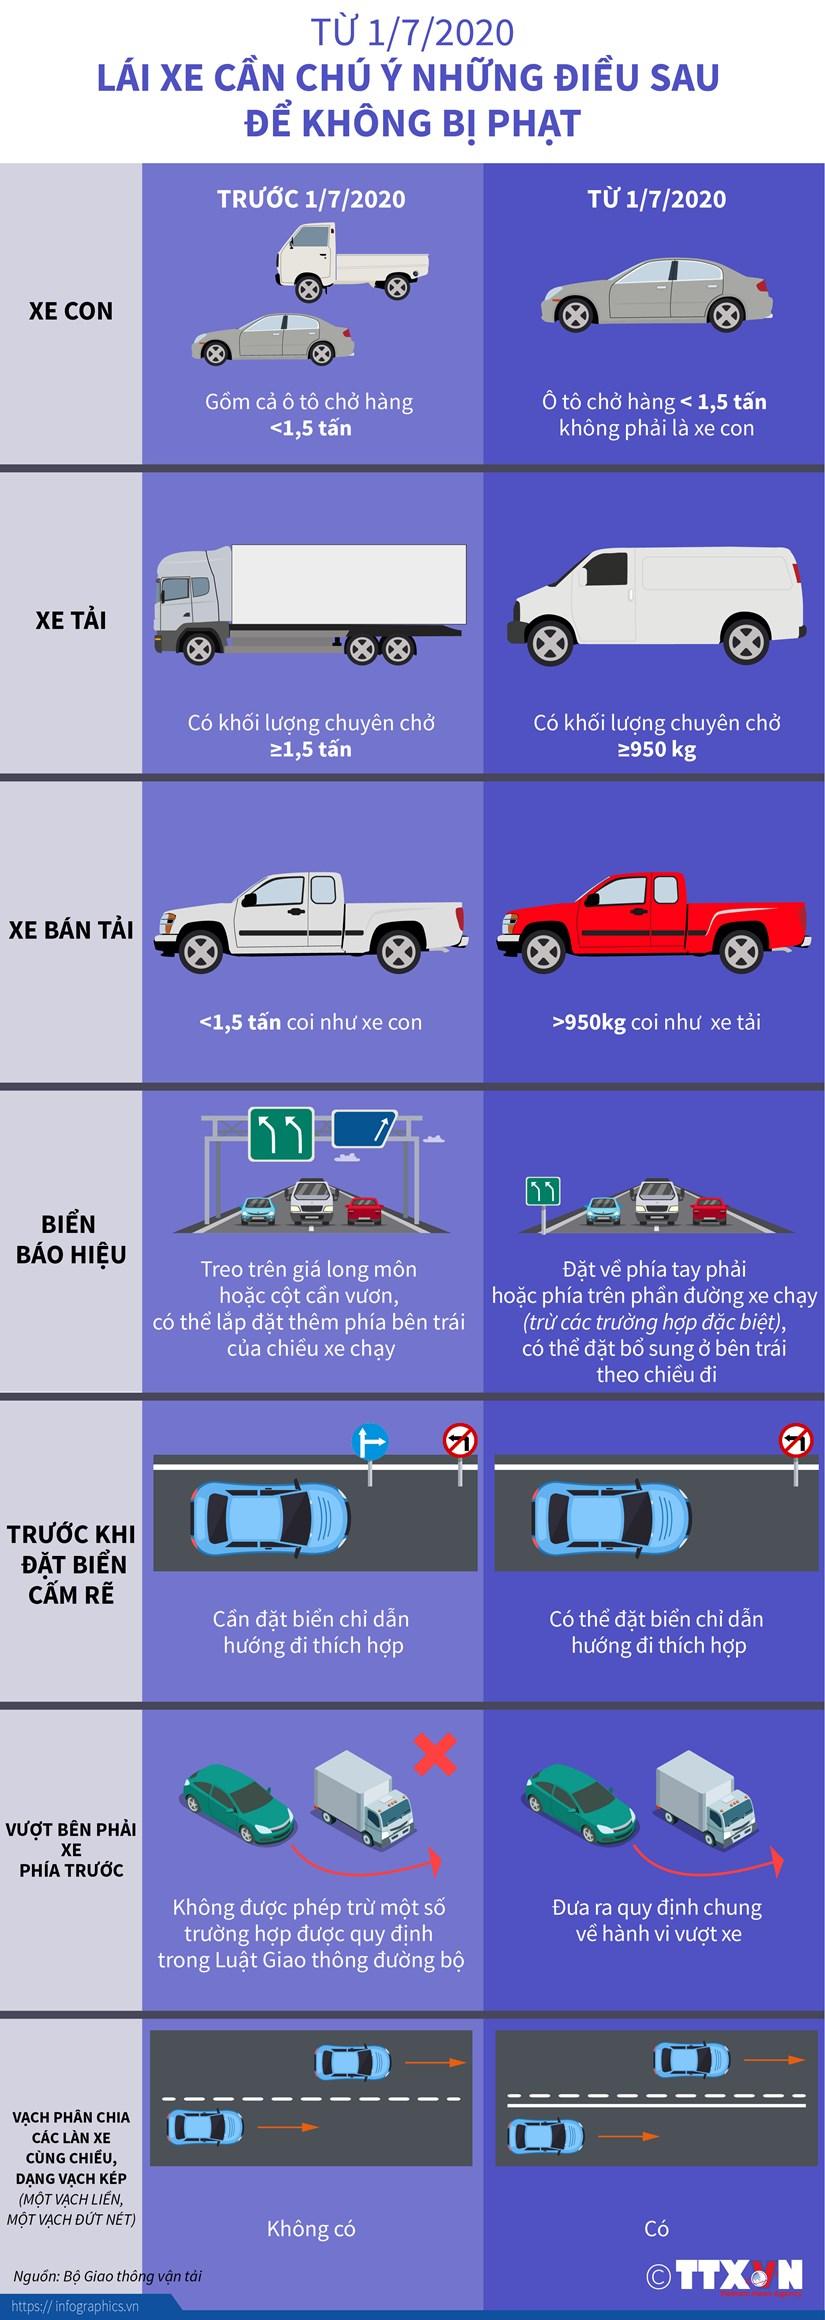 [Infographics] Tu 1/7 lai xe can chu y nhung dieu sau de khong bi phat hinh anh 1